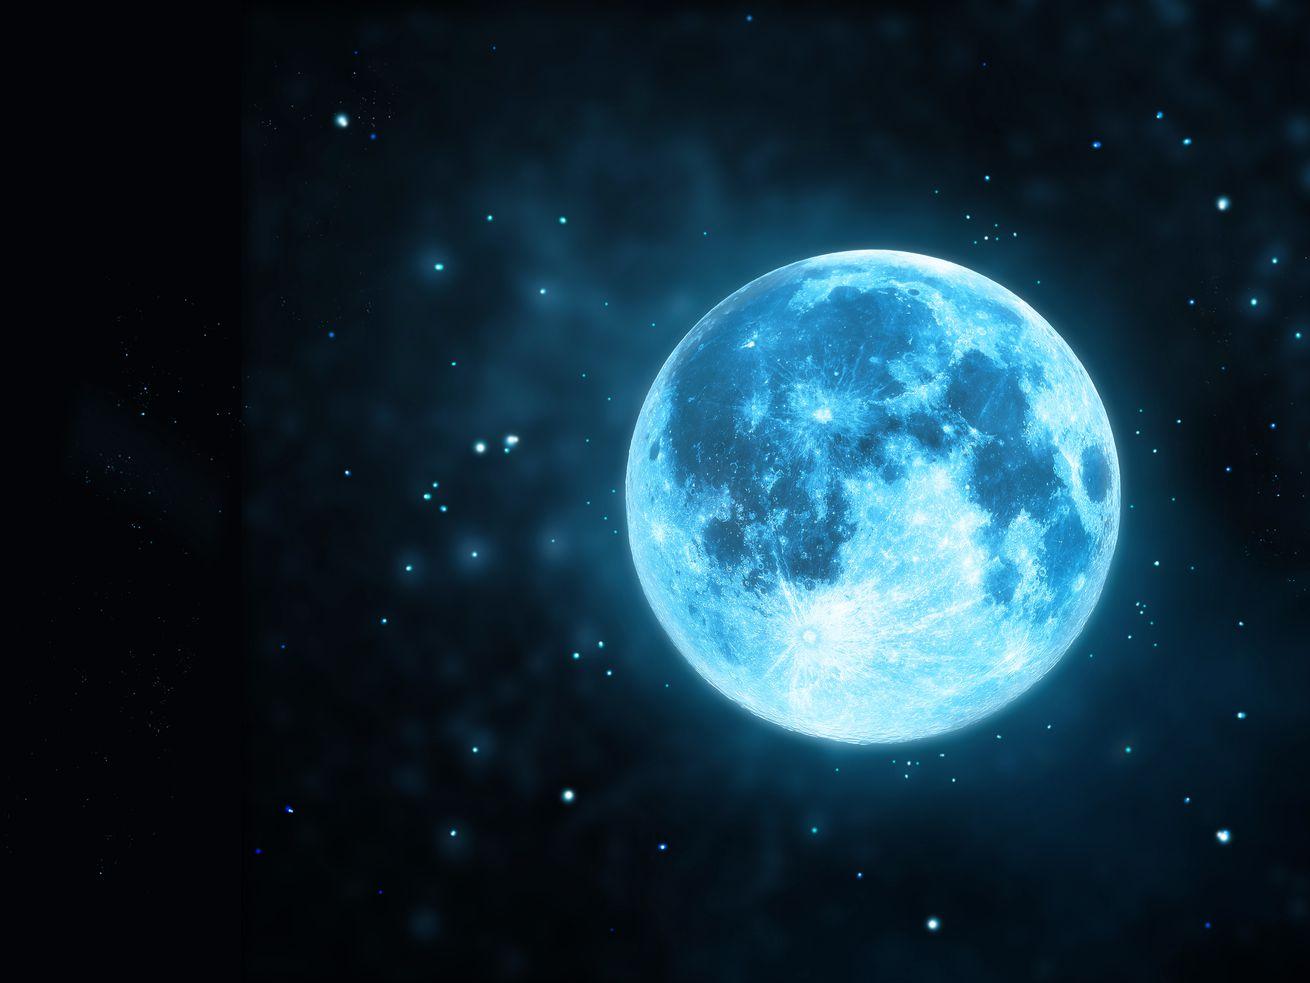 What is moondust?